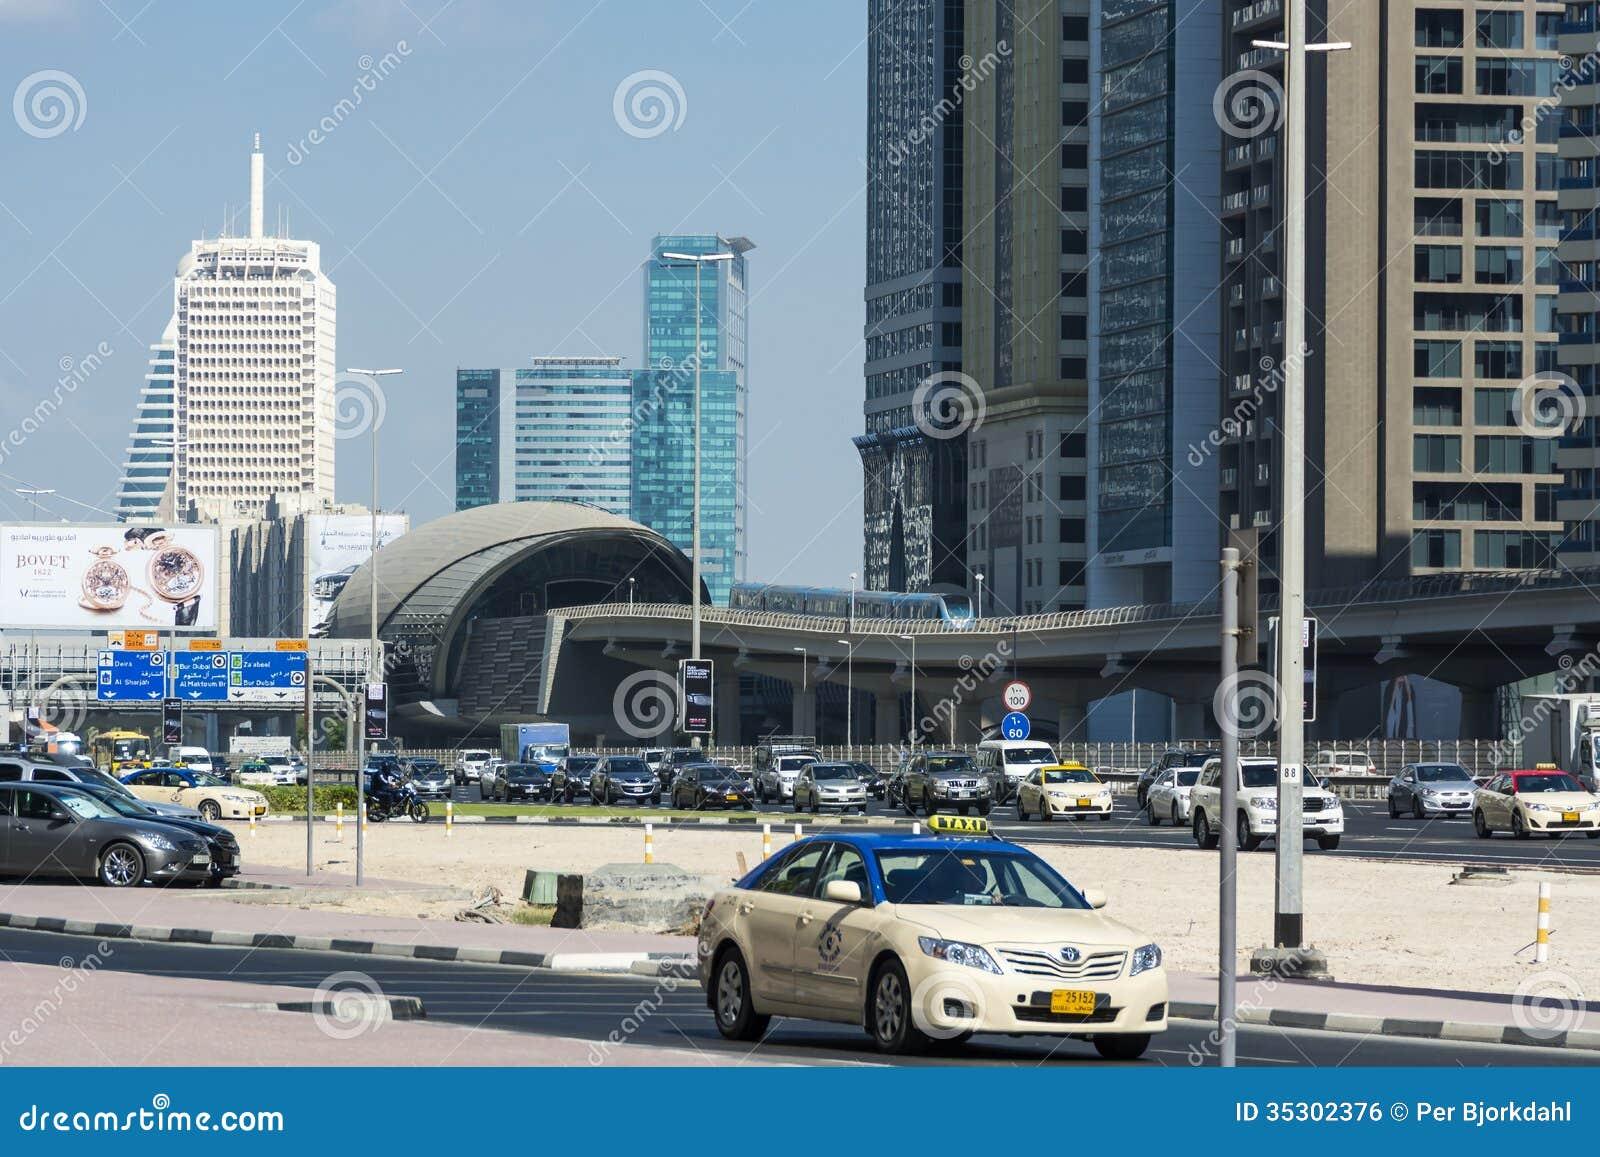 Sheik Zayed road and Metro station